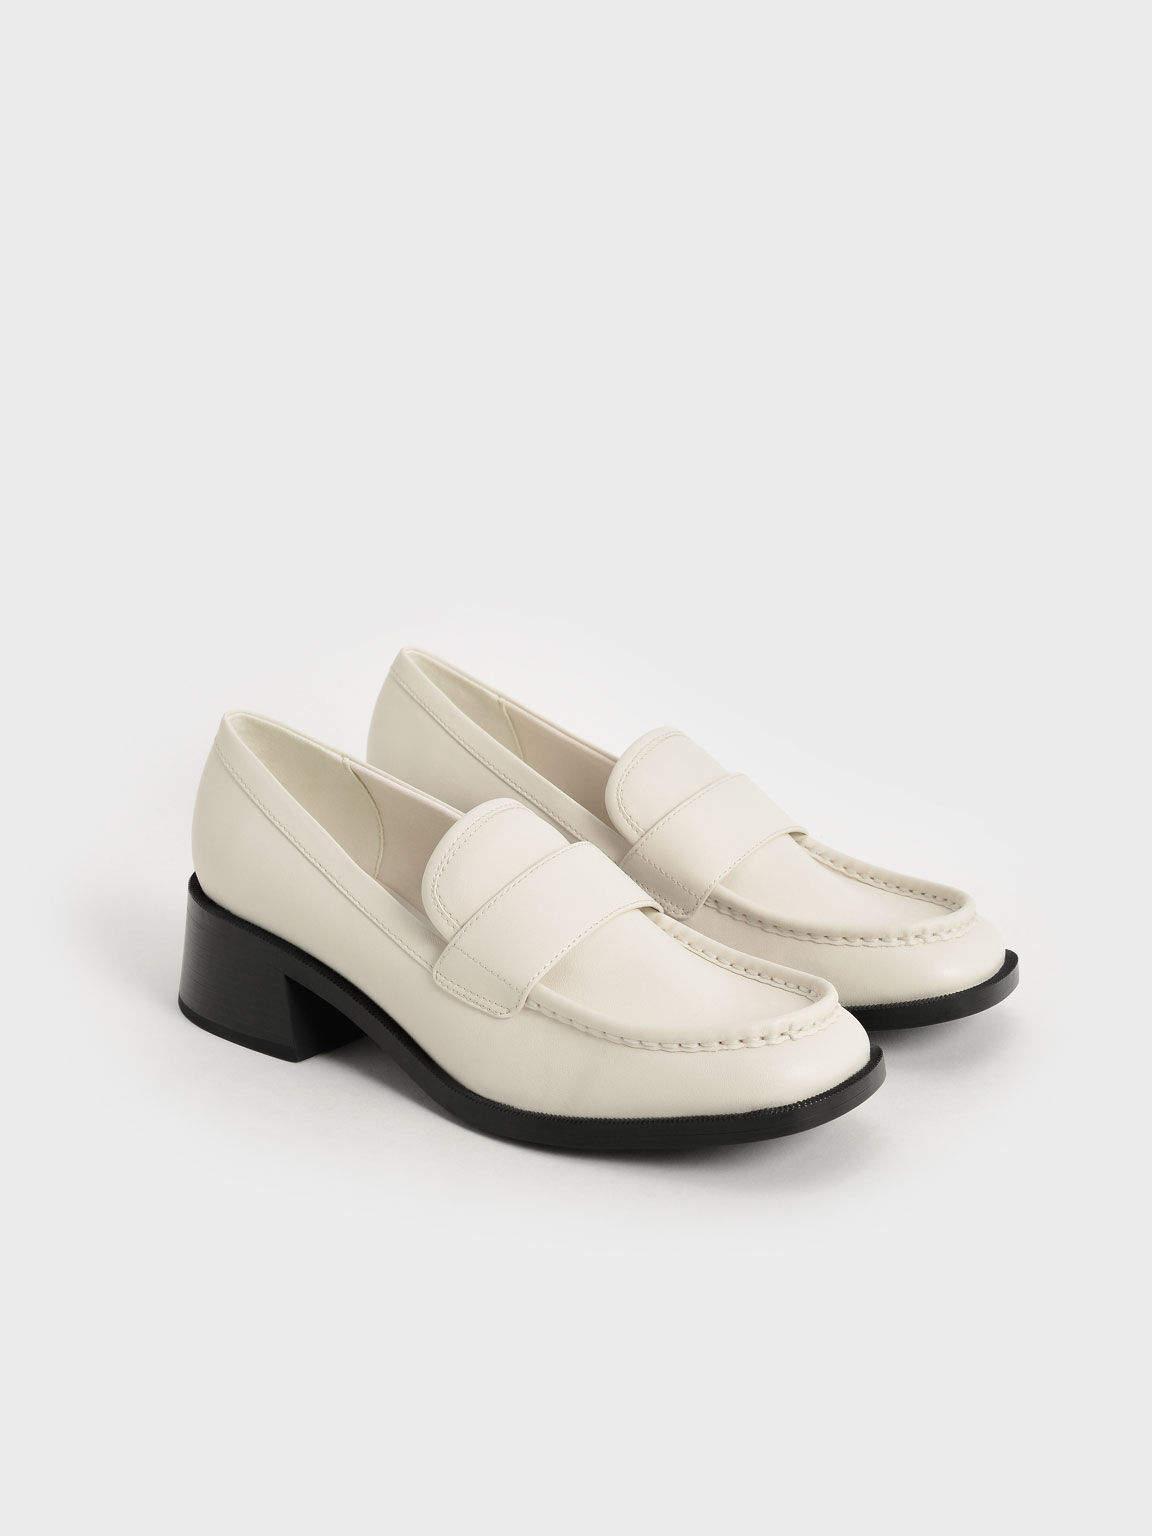 Sepatu Block Heel Penny Loafers, Chalk, hi-res